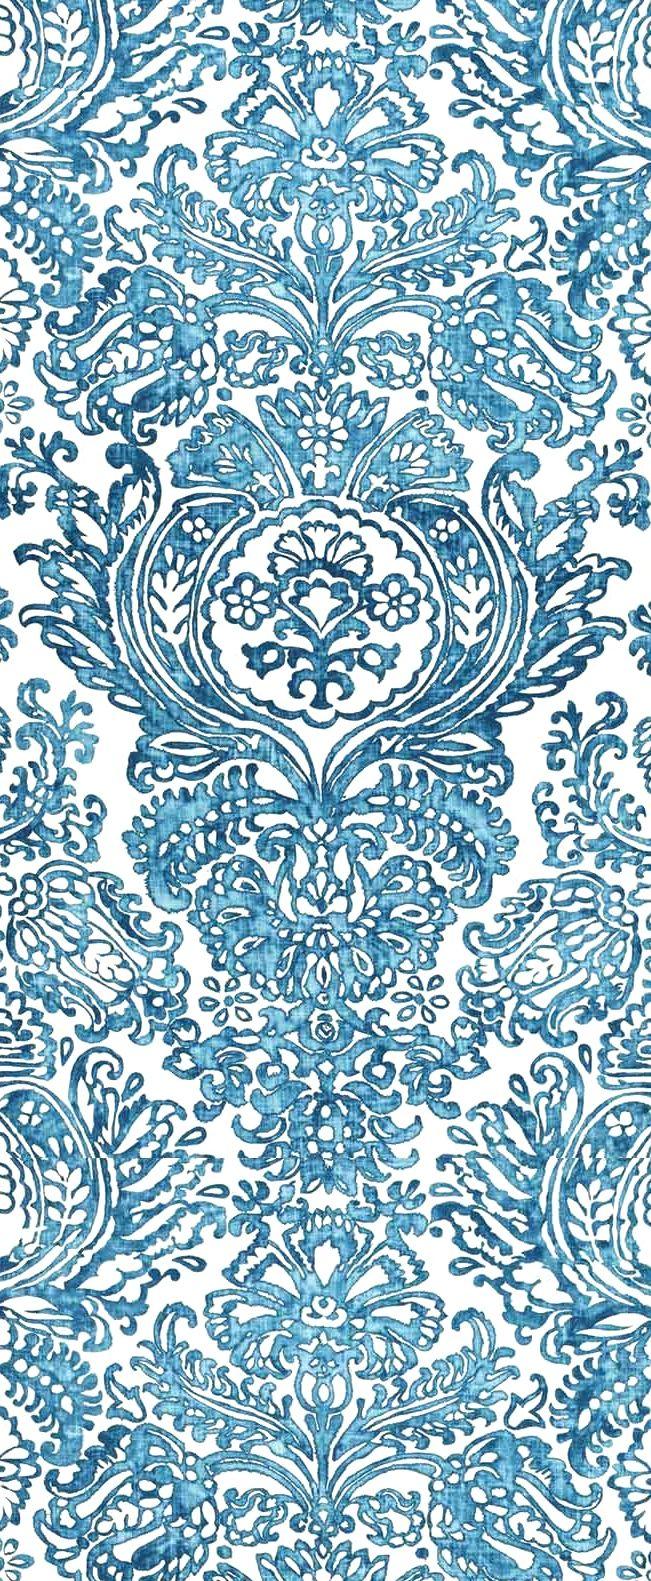 Best 10+ Turquoise pattern ideas on Pinterest | Moroccan tiles ...